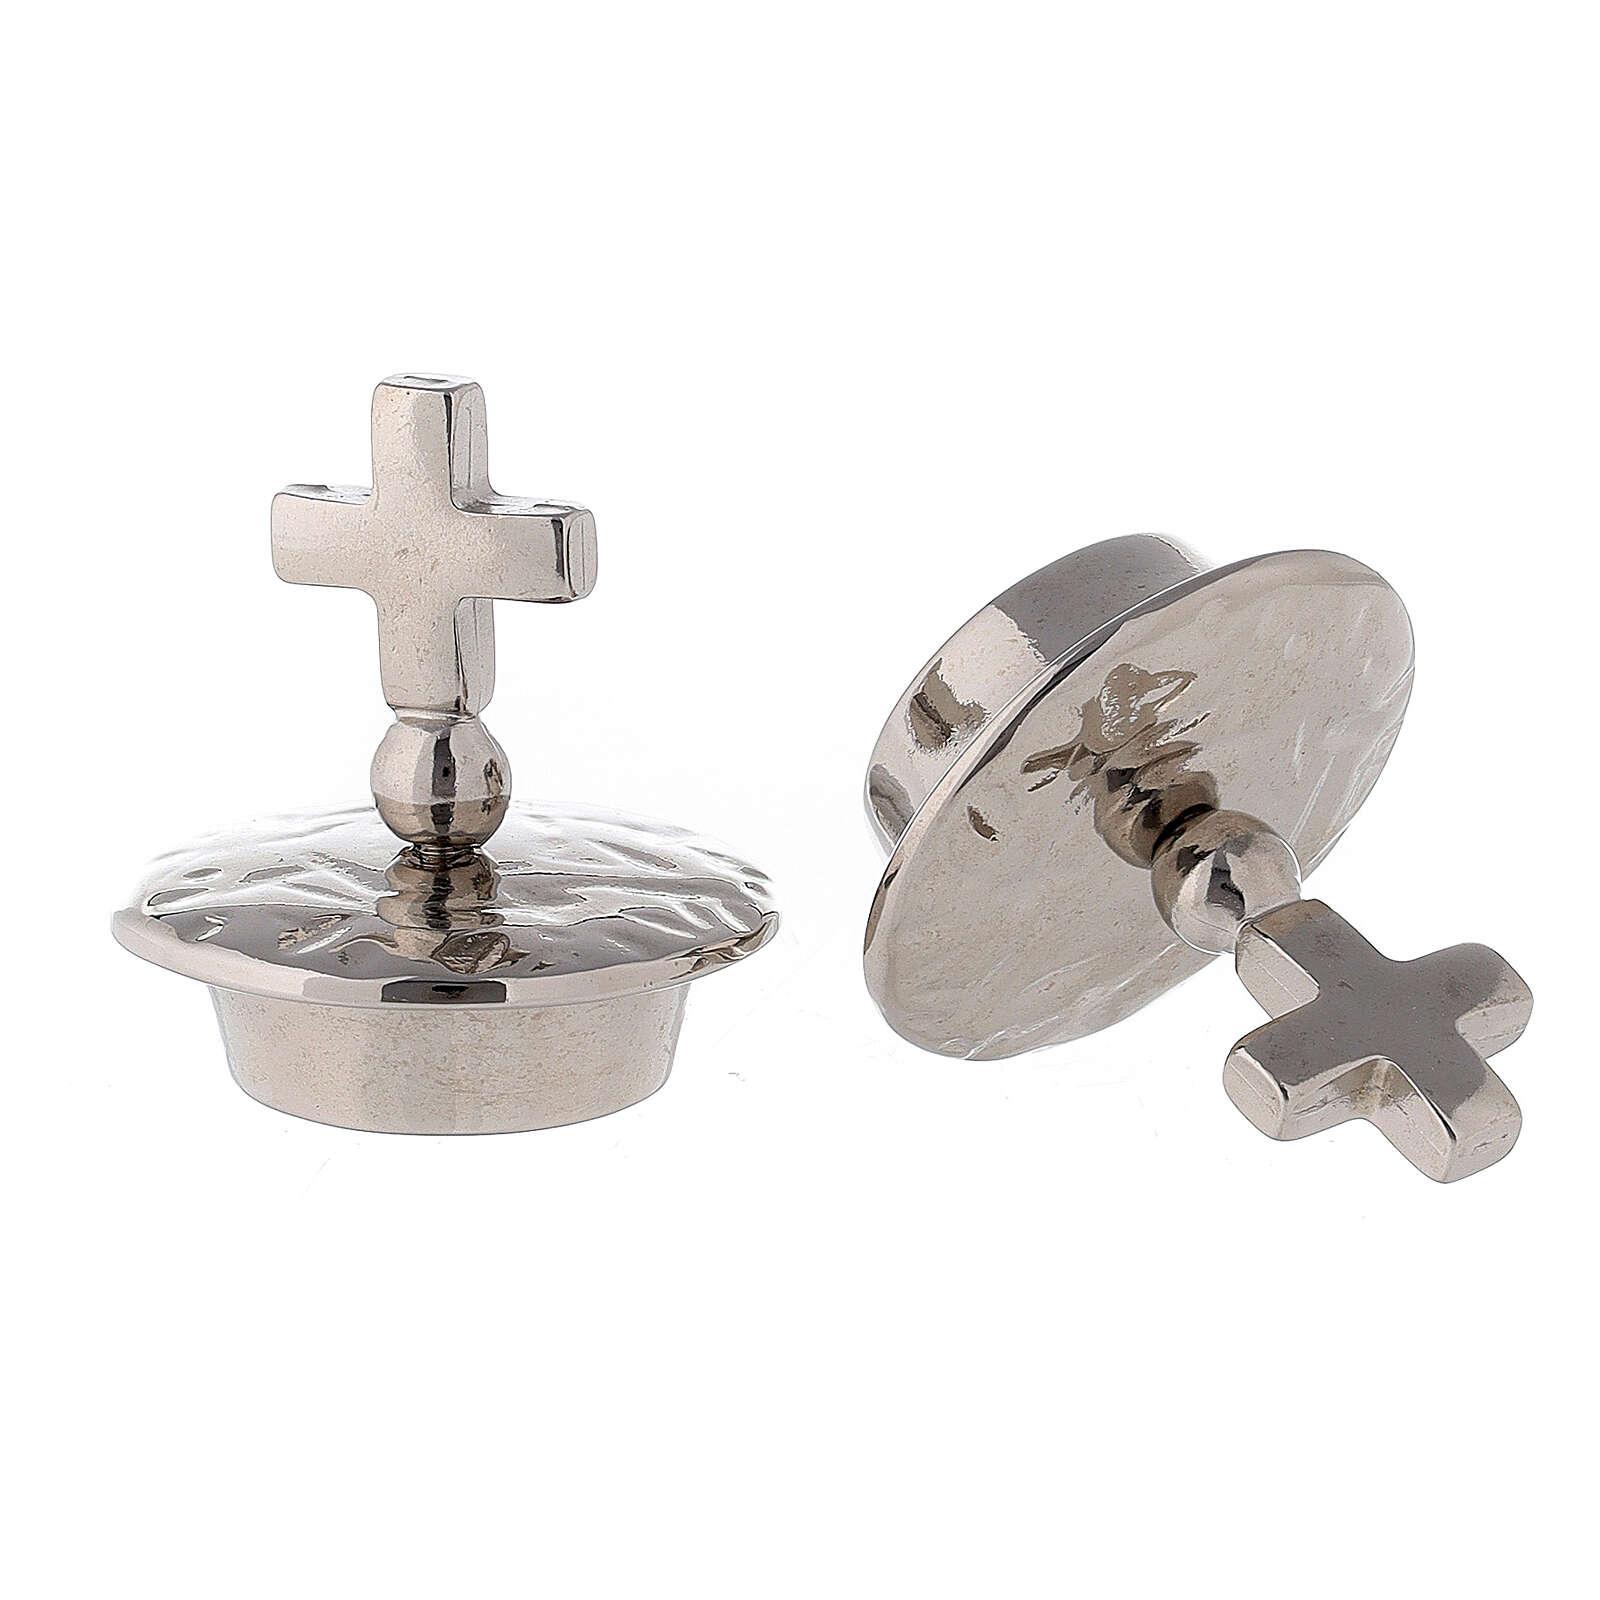 Simple cross caps silver plated brass 24K for Venezia-Roma jugs 4